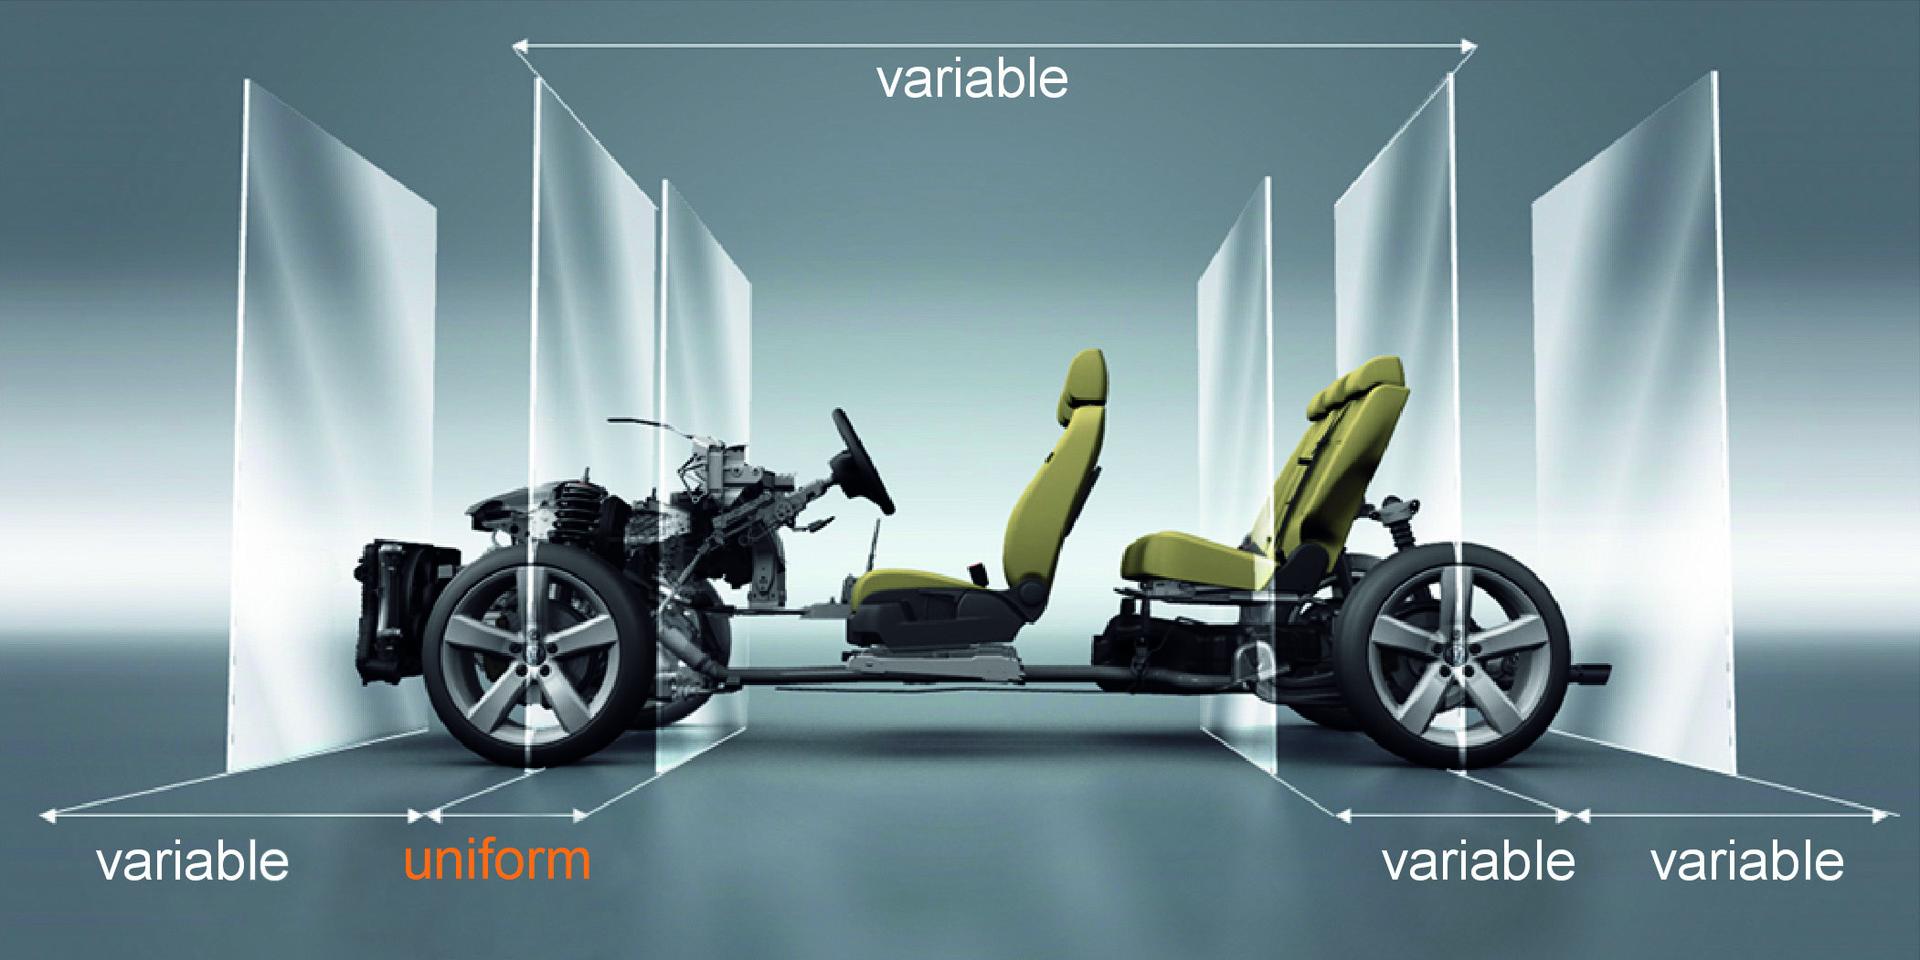 Press Workshop: MQB ? Modular Transverse Matrix and new engines, Wolfsburg, 31.01. ? 02.02.2012